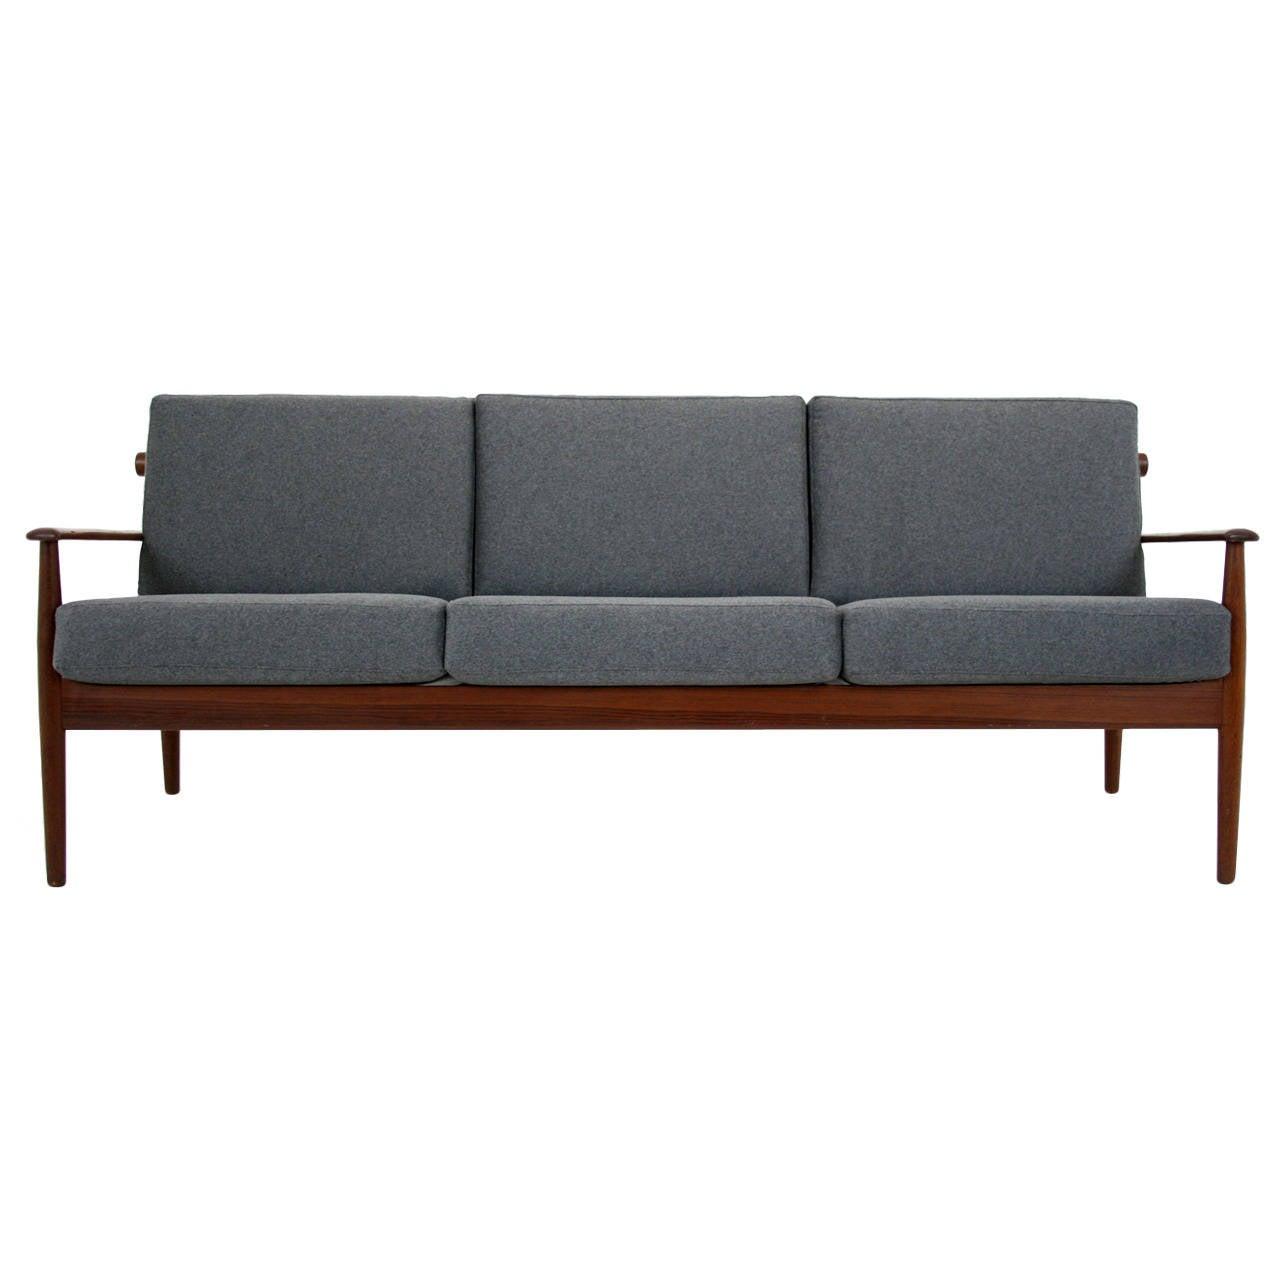 Danish mid century modern stunning teak three seat sofa or couch at 1stdibs - Vancouver mid century modern furniture ...